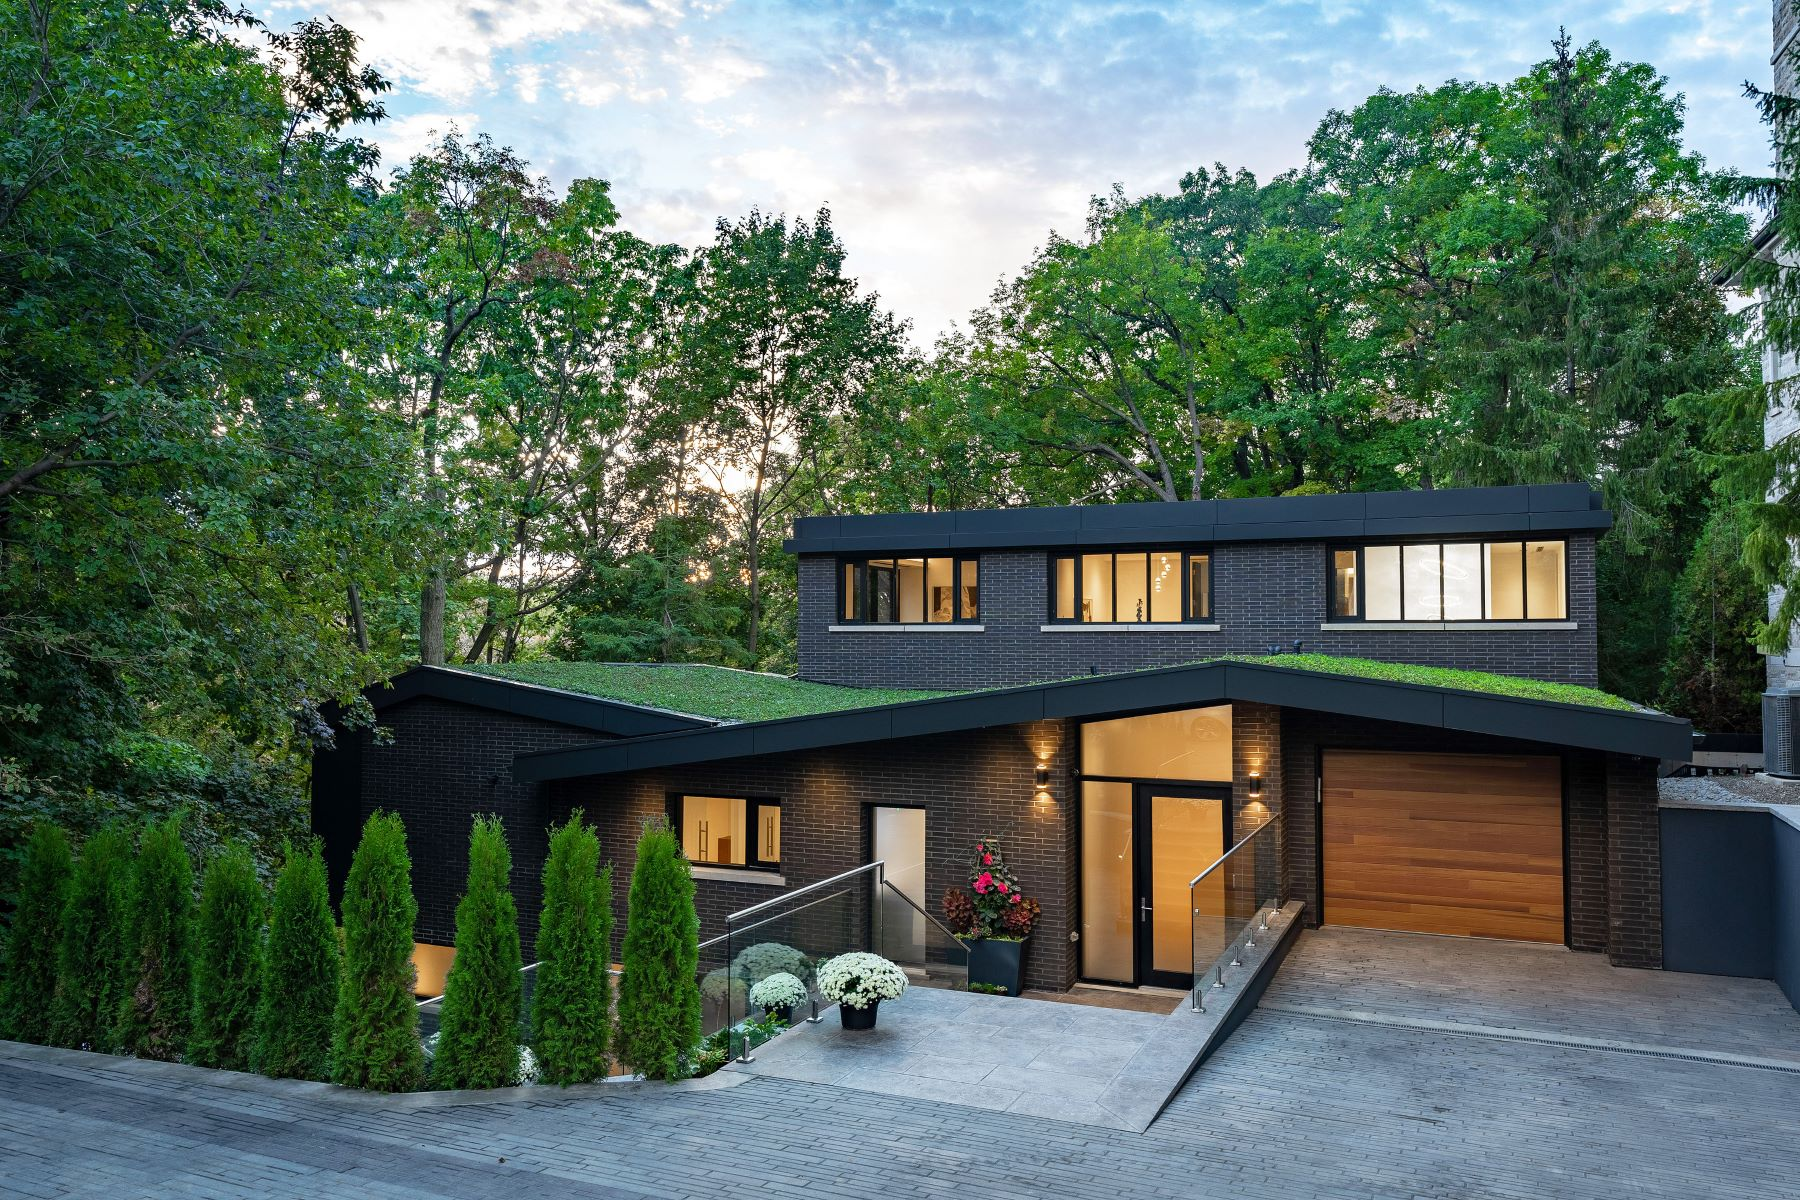 Single Family Home for Sale at Contemporary Living 106 Glen Road Toronto, Ontario M4W 2V9 Canada